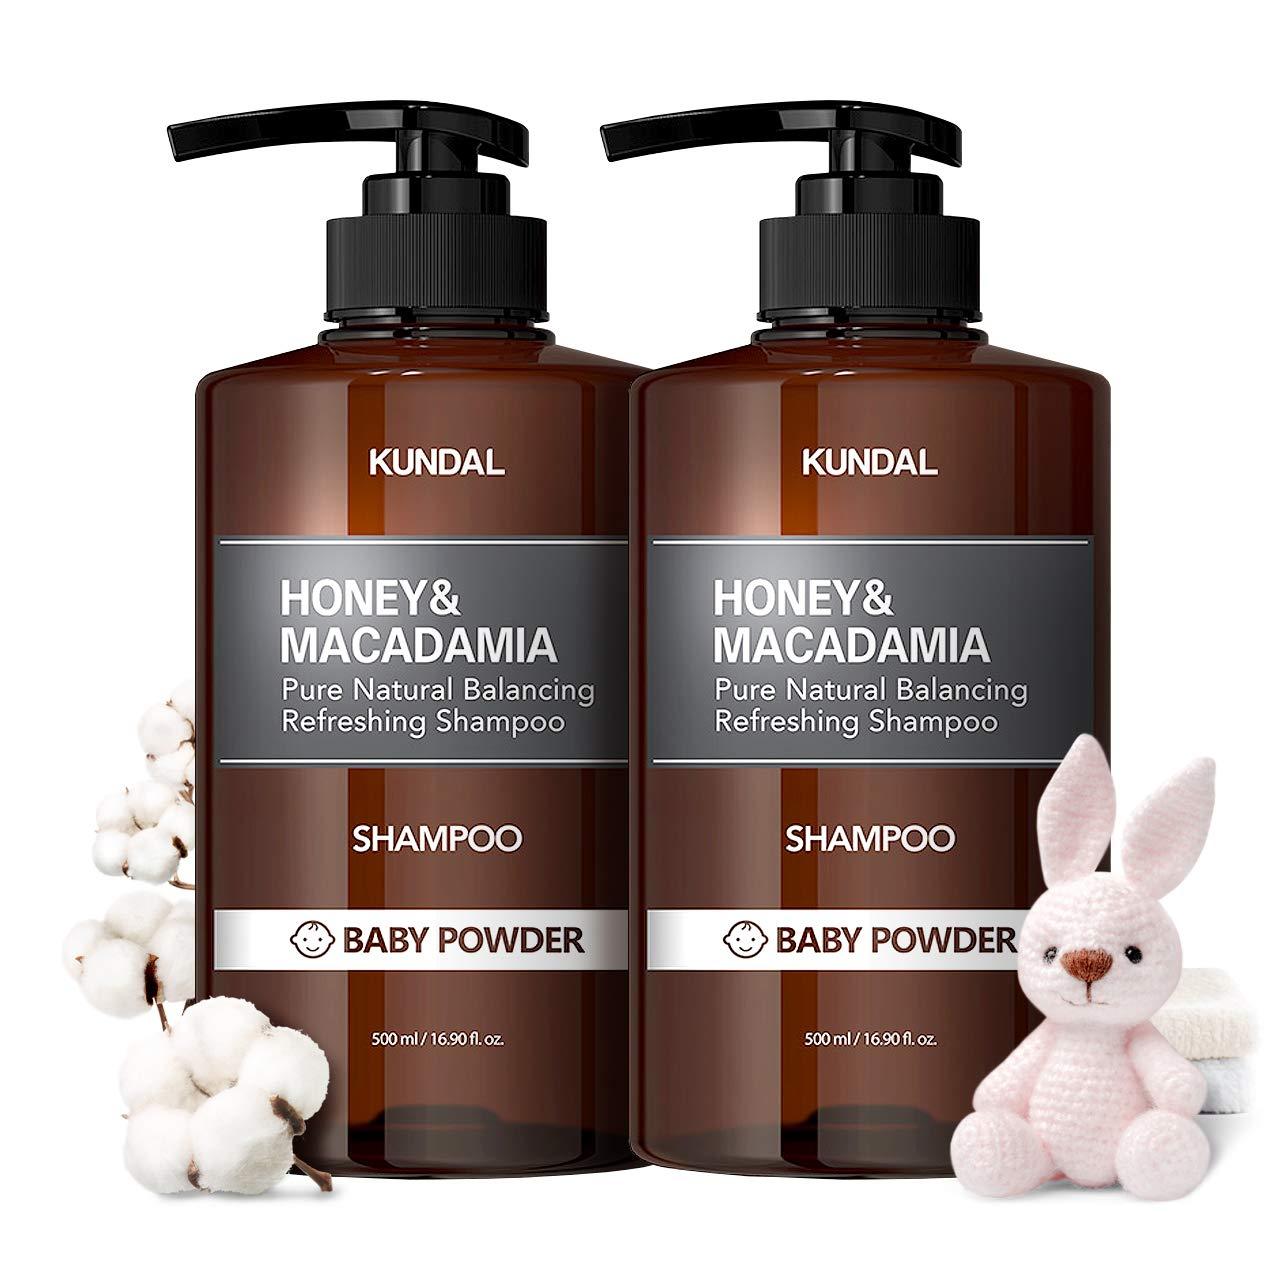 KUNDAL HONEY & MACADAMIA Natural Shampoo (Baby Powder) - 16.9 fl.oz(500ml) x2 bottles, Sulfate Free Paraben Free